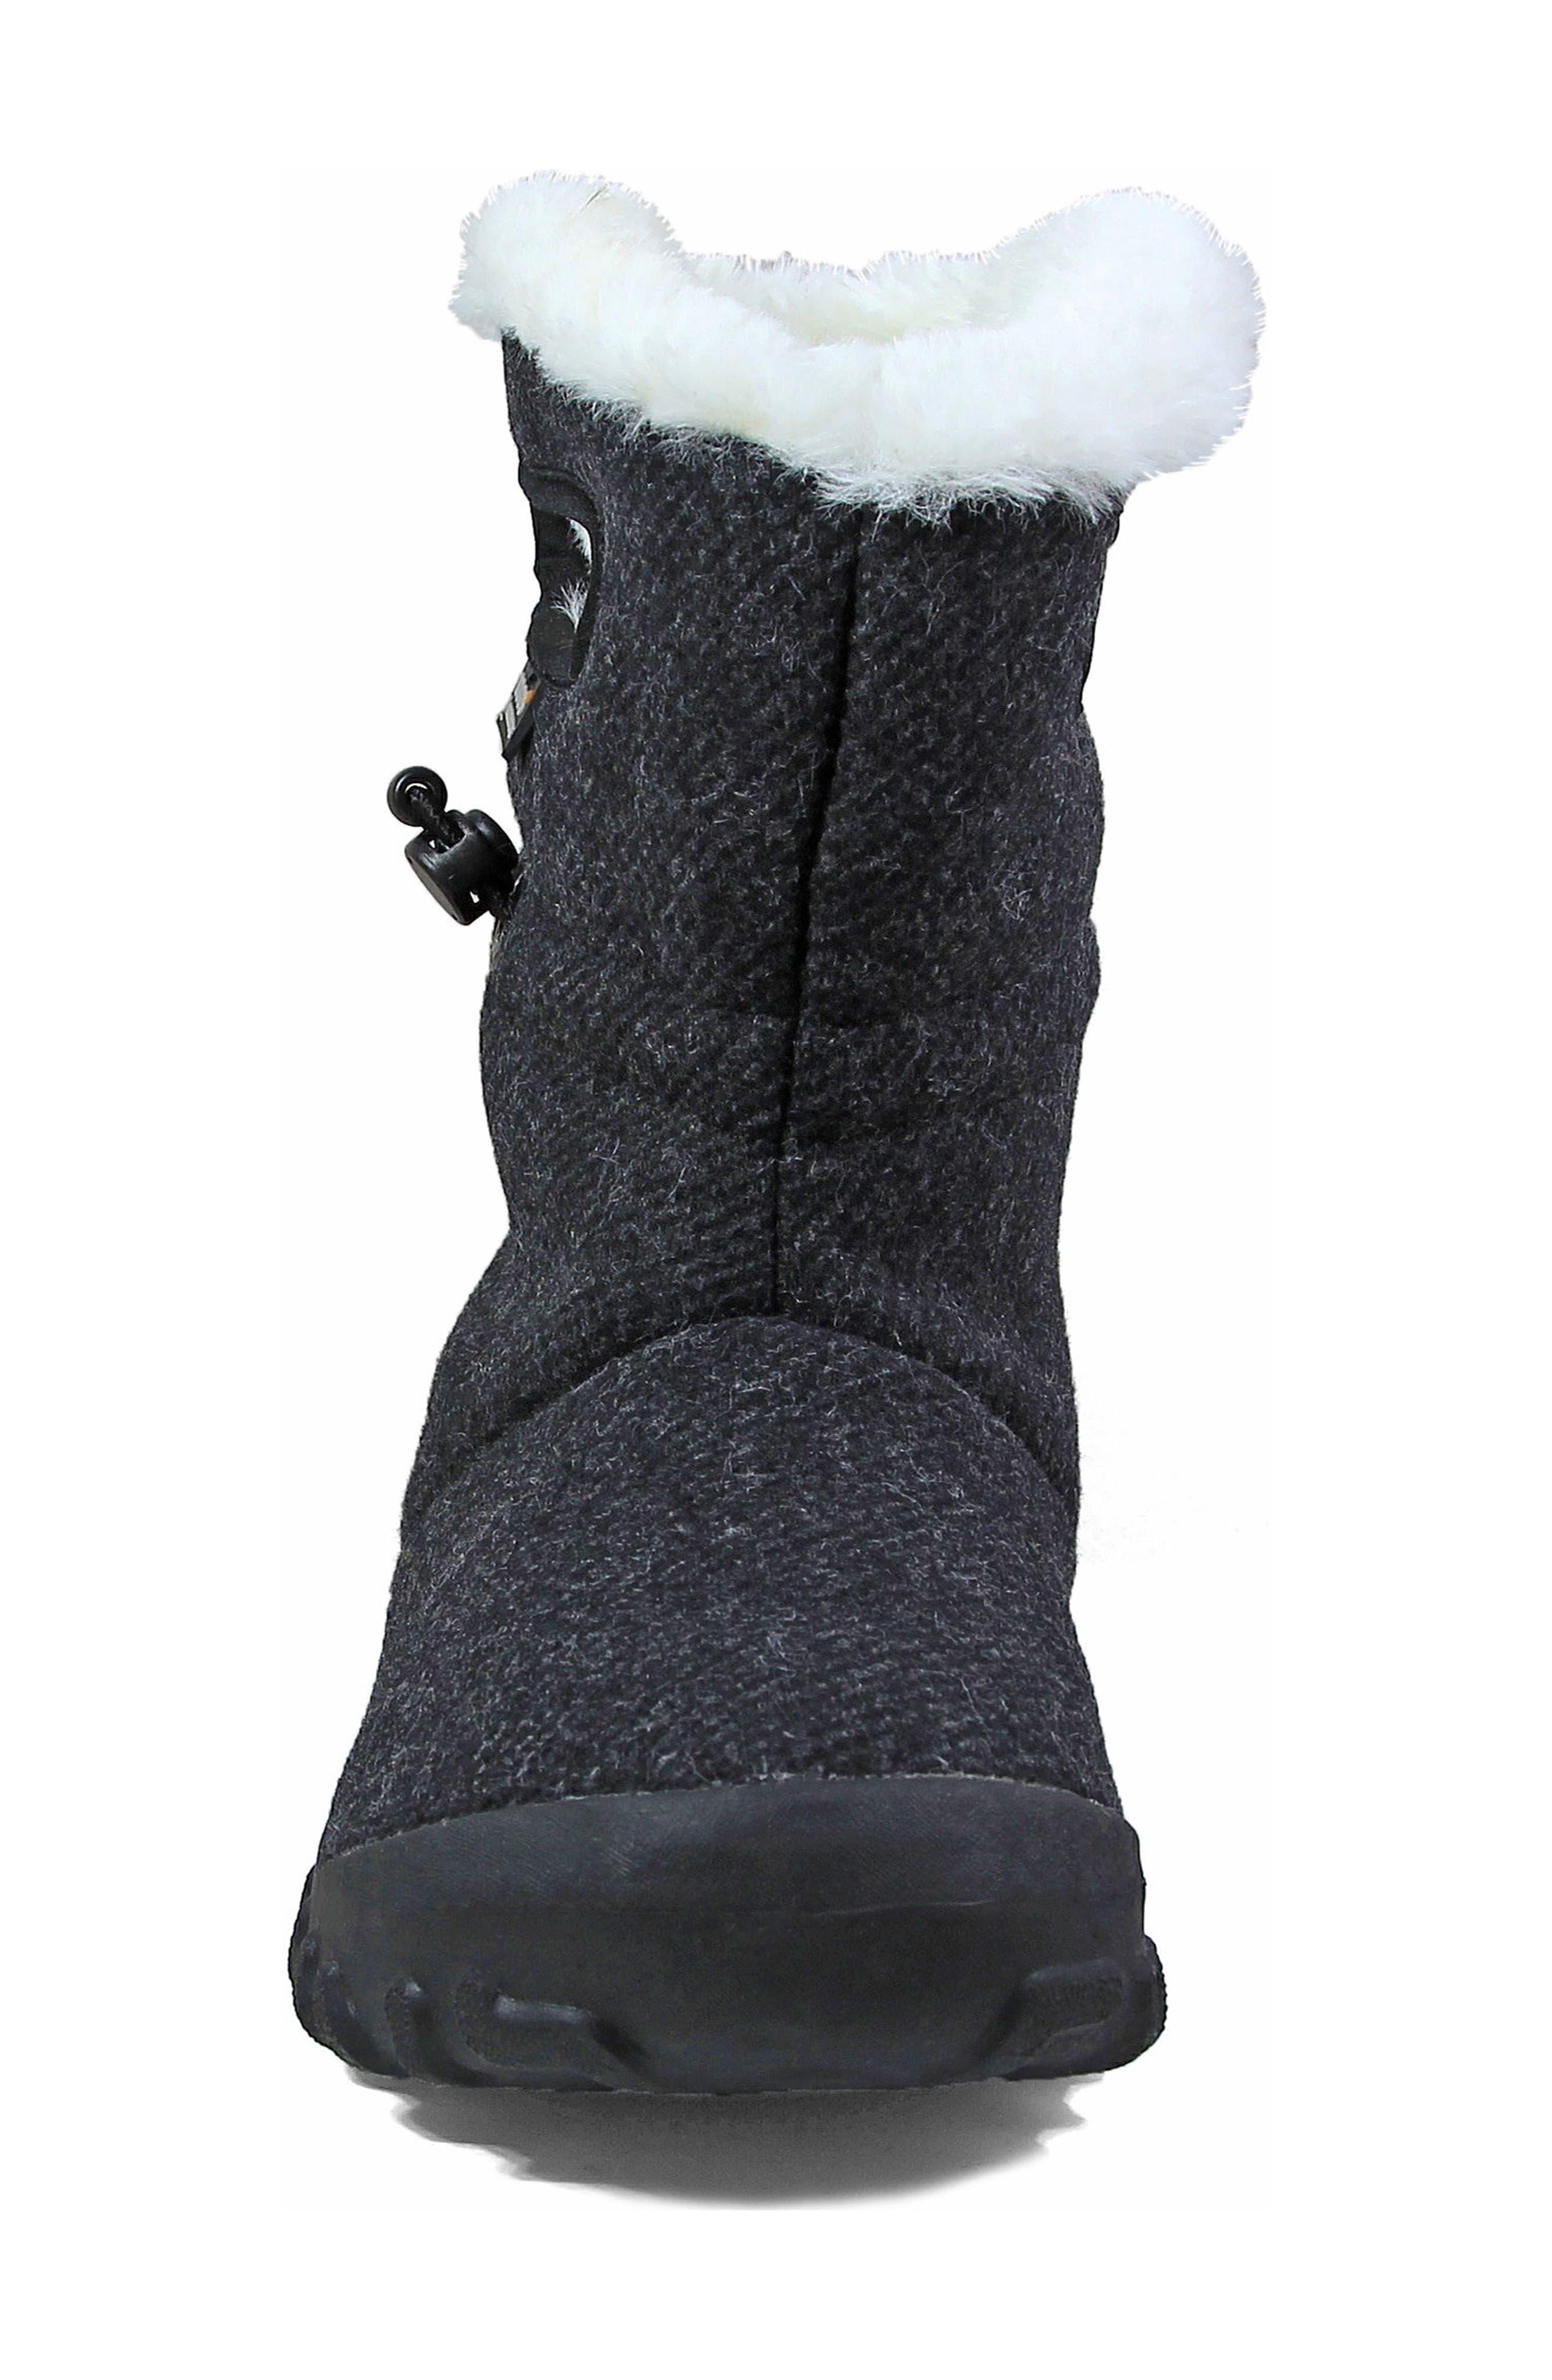 B-Moc Waterproof Boot,                             Alternate thumbnail 4, color,                             005